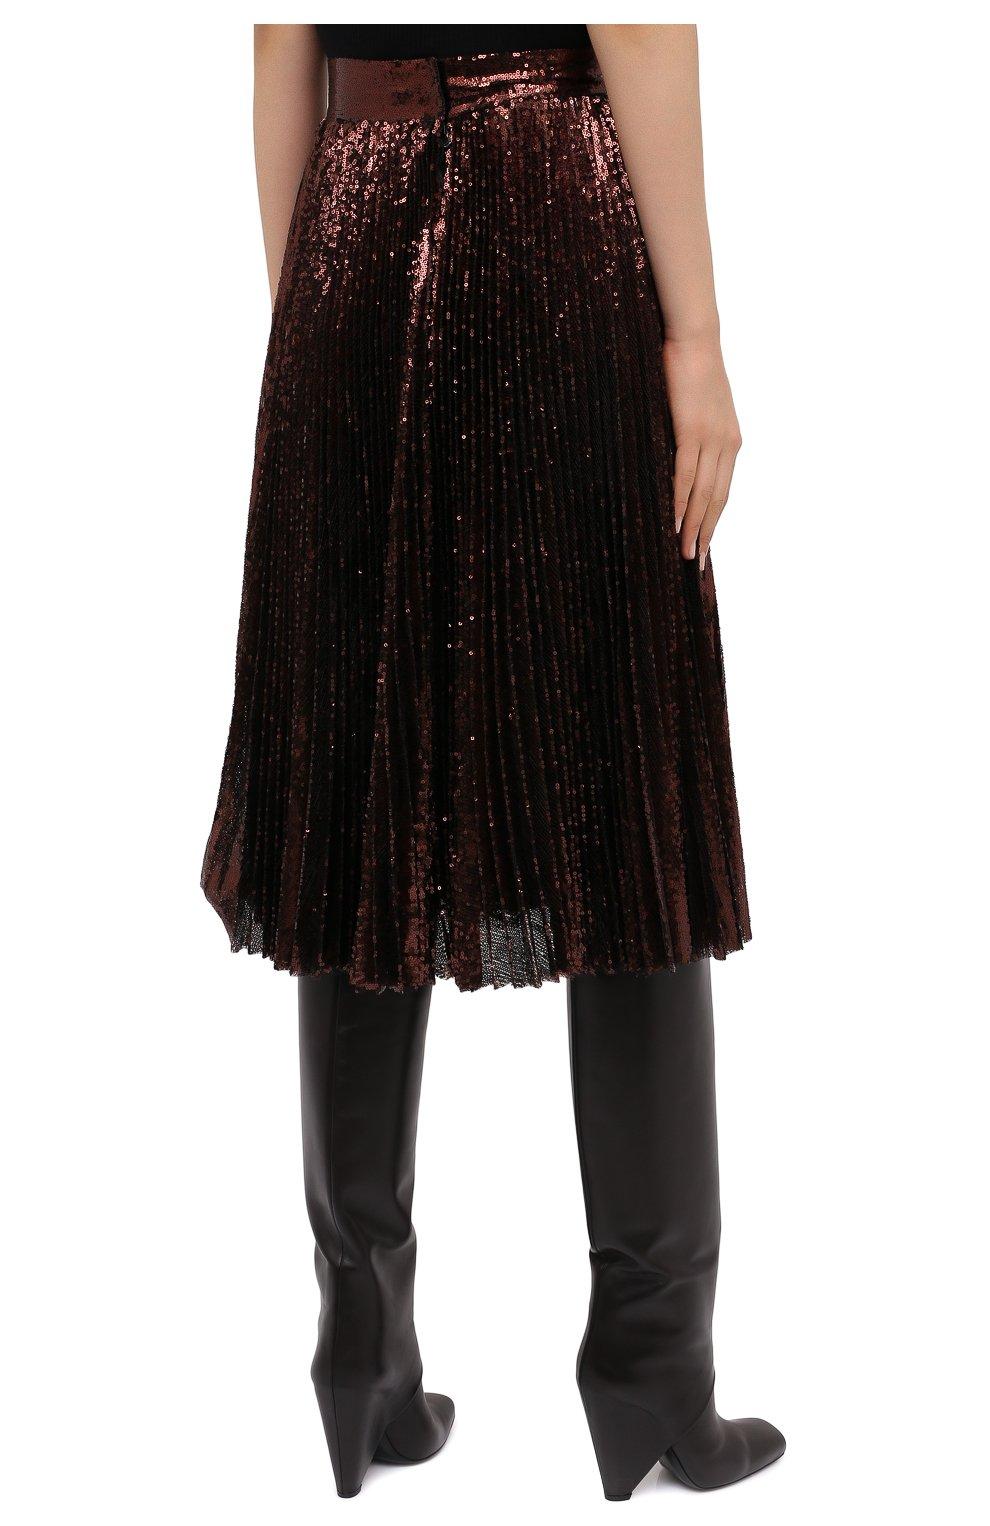 Женская юбка DOLCE & GABBANA бронзового цвета, арт. F4BYGT/FLMK4 | Фото 4